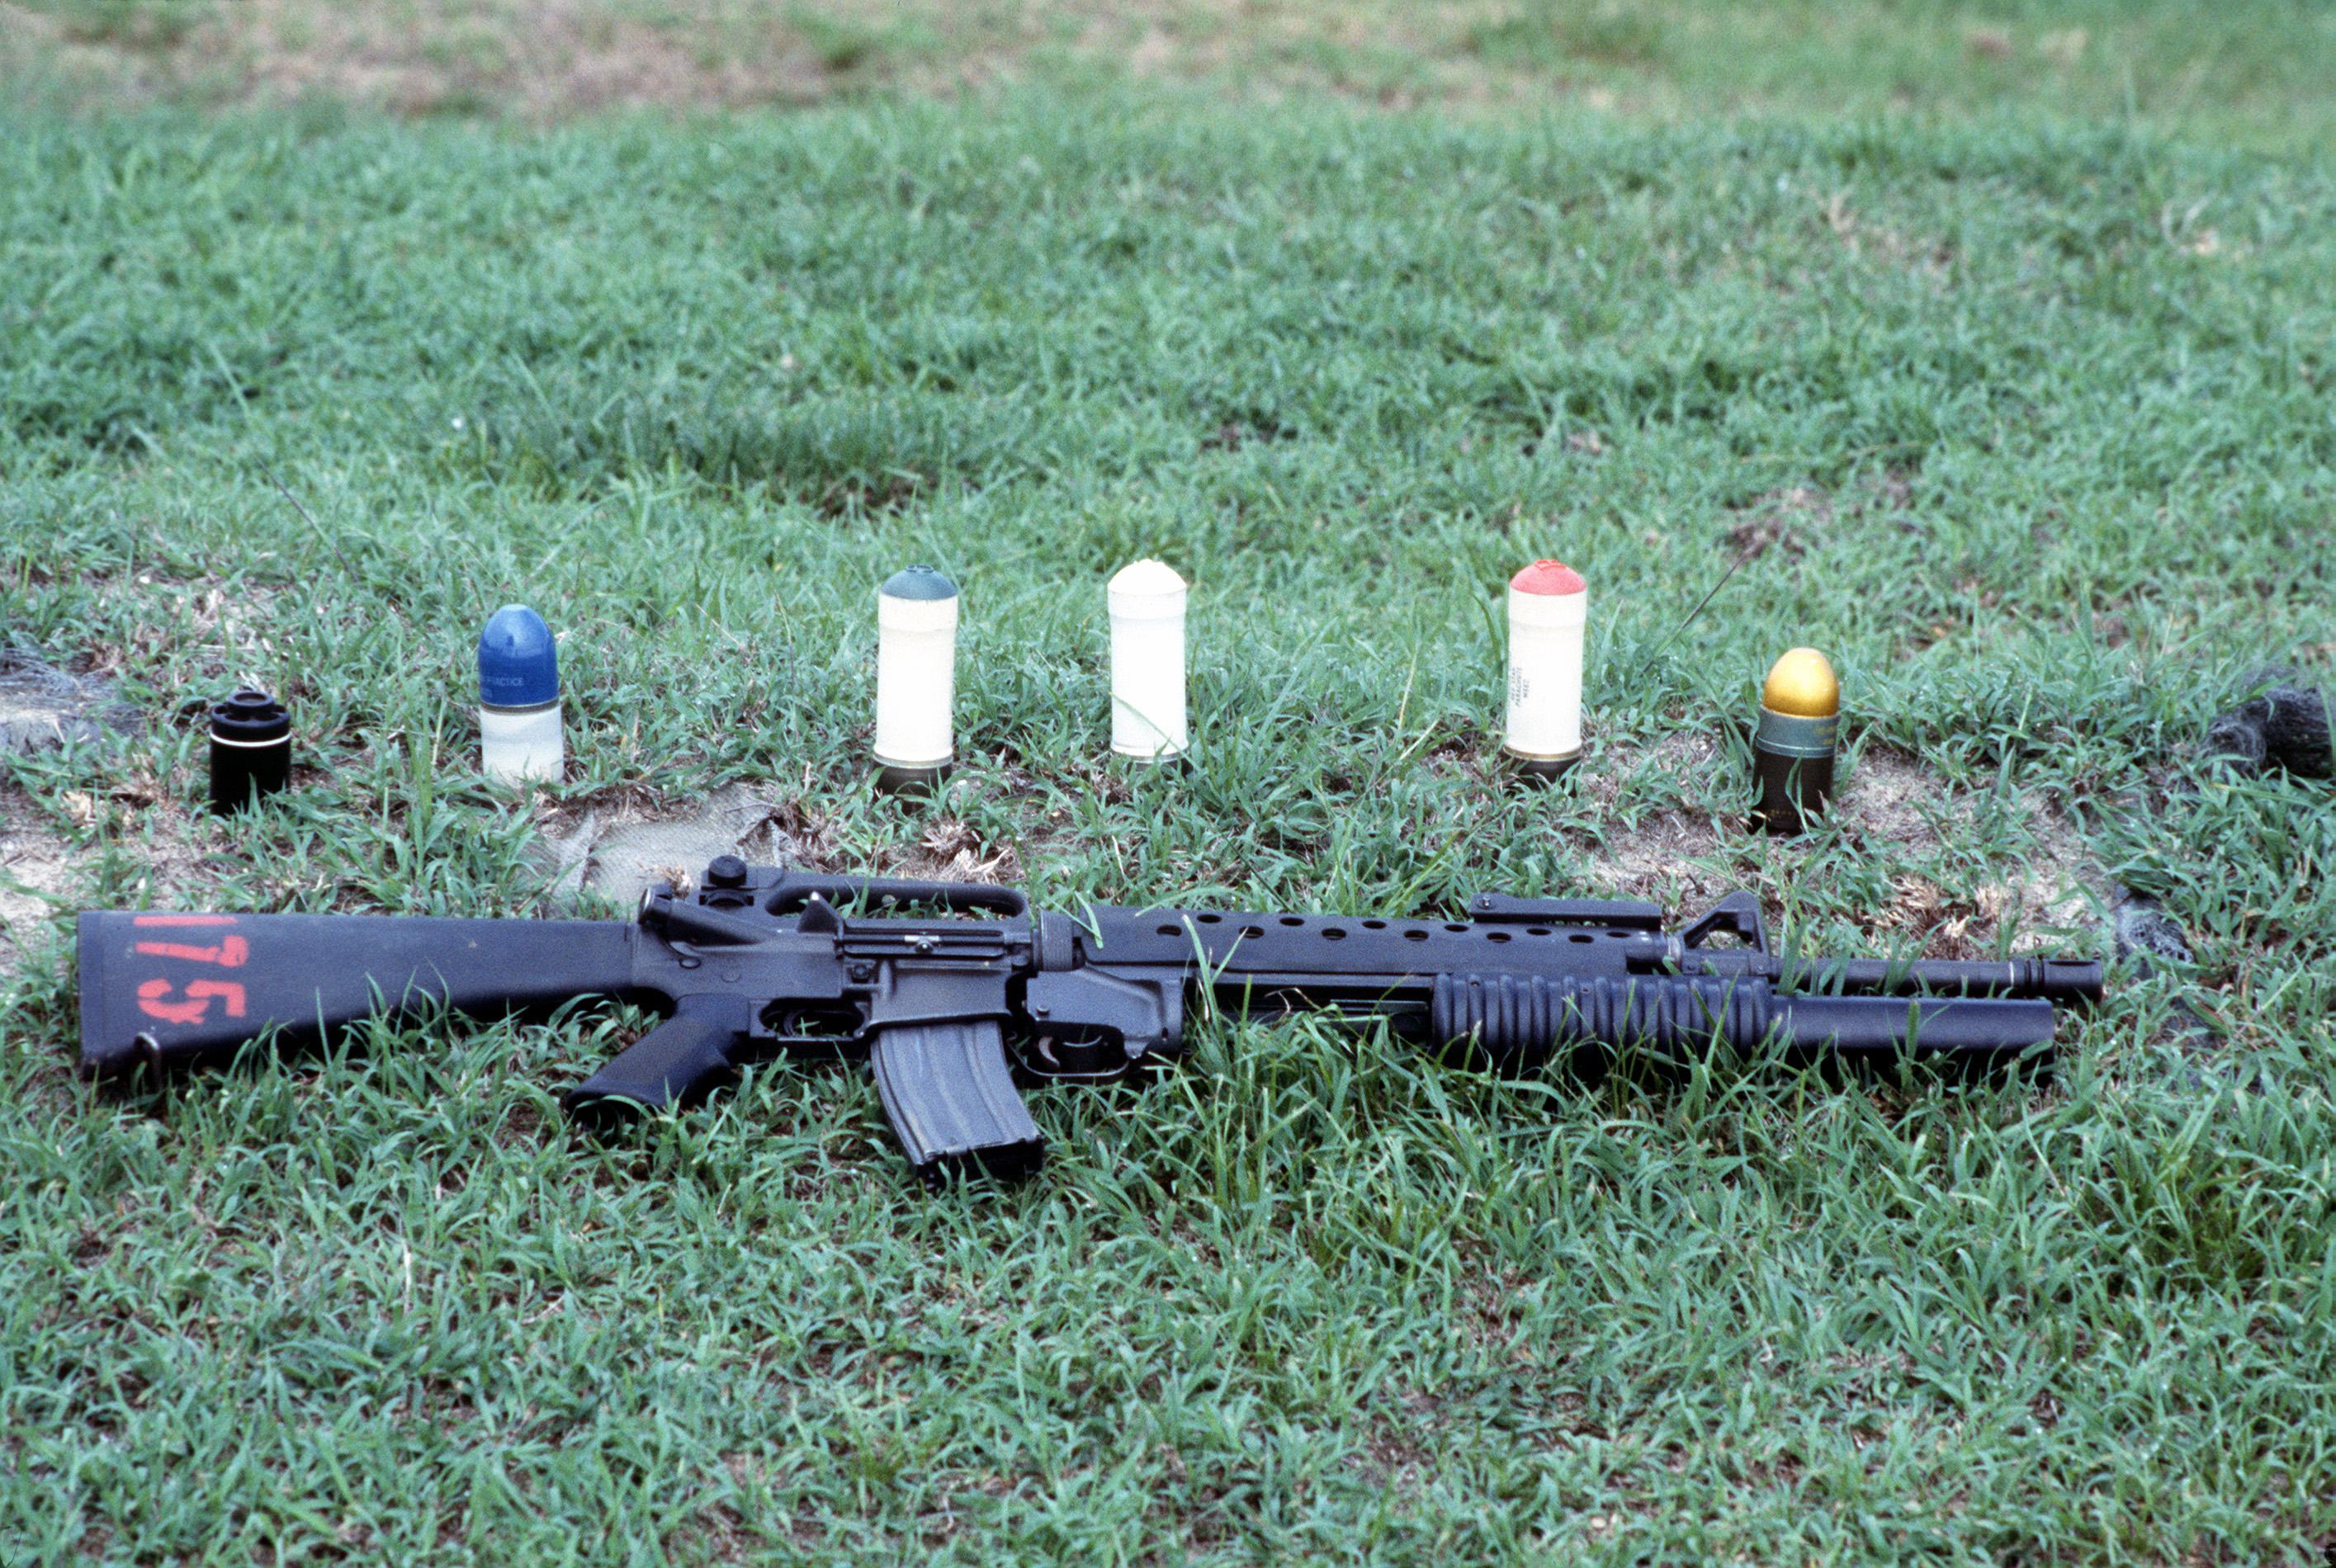 M203 grenade launcher | Military Wiki | FANDOM powered by Wikia